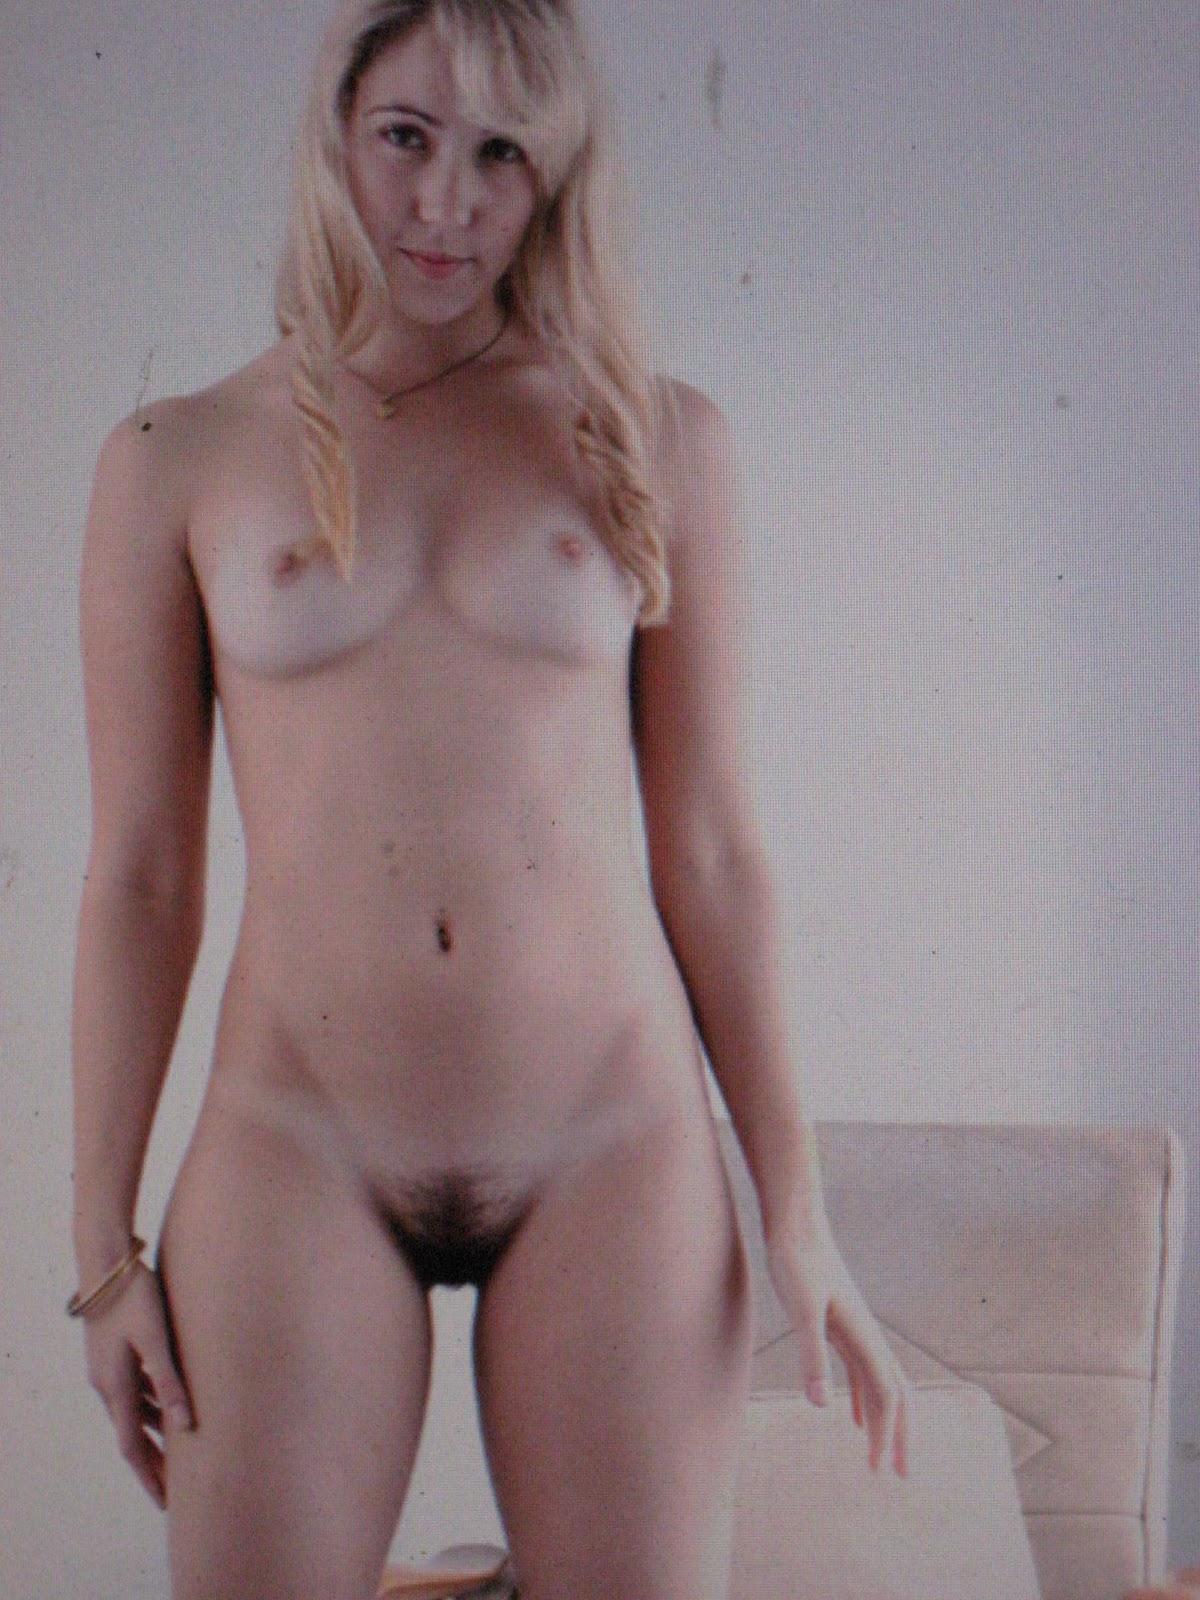 I see naked women